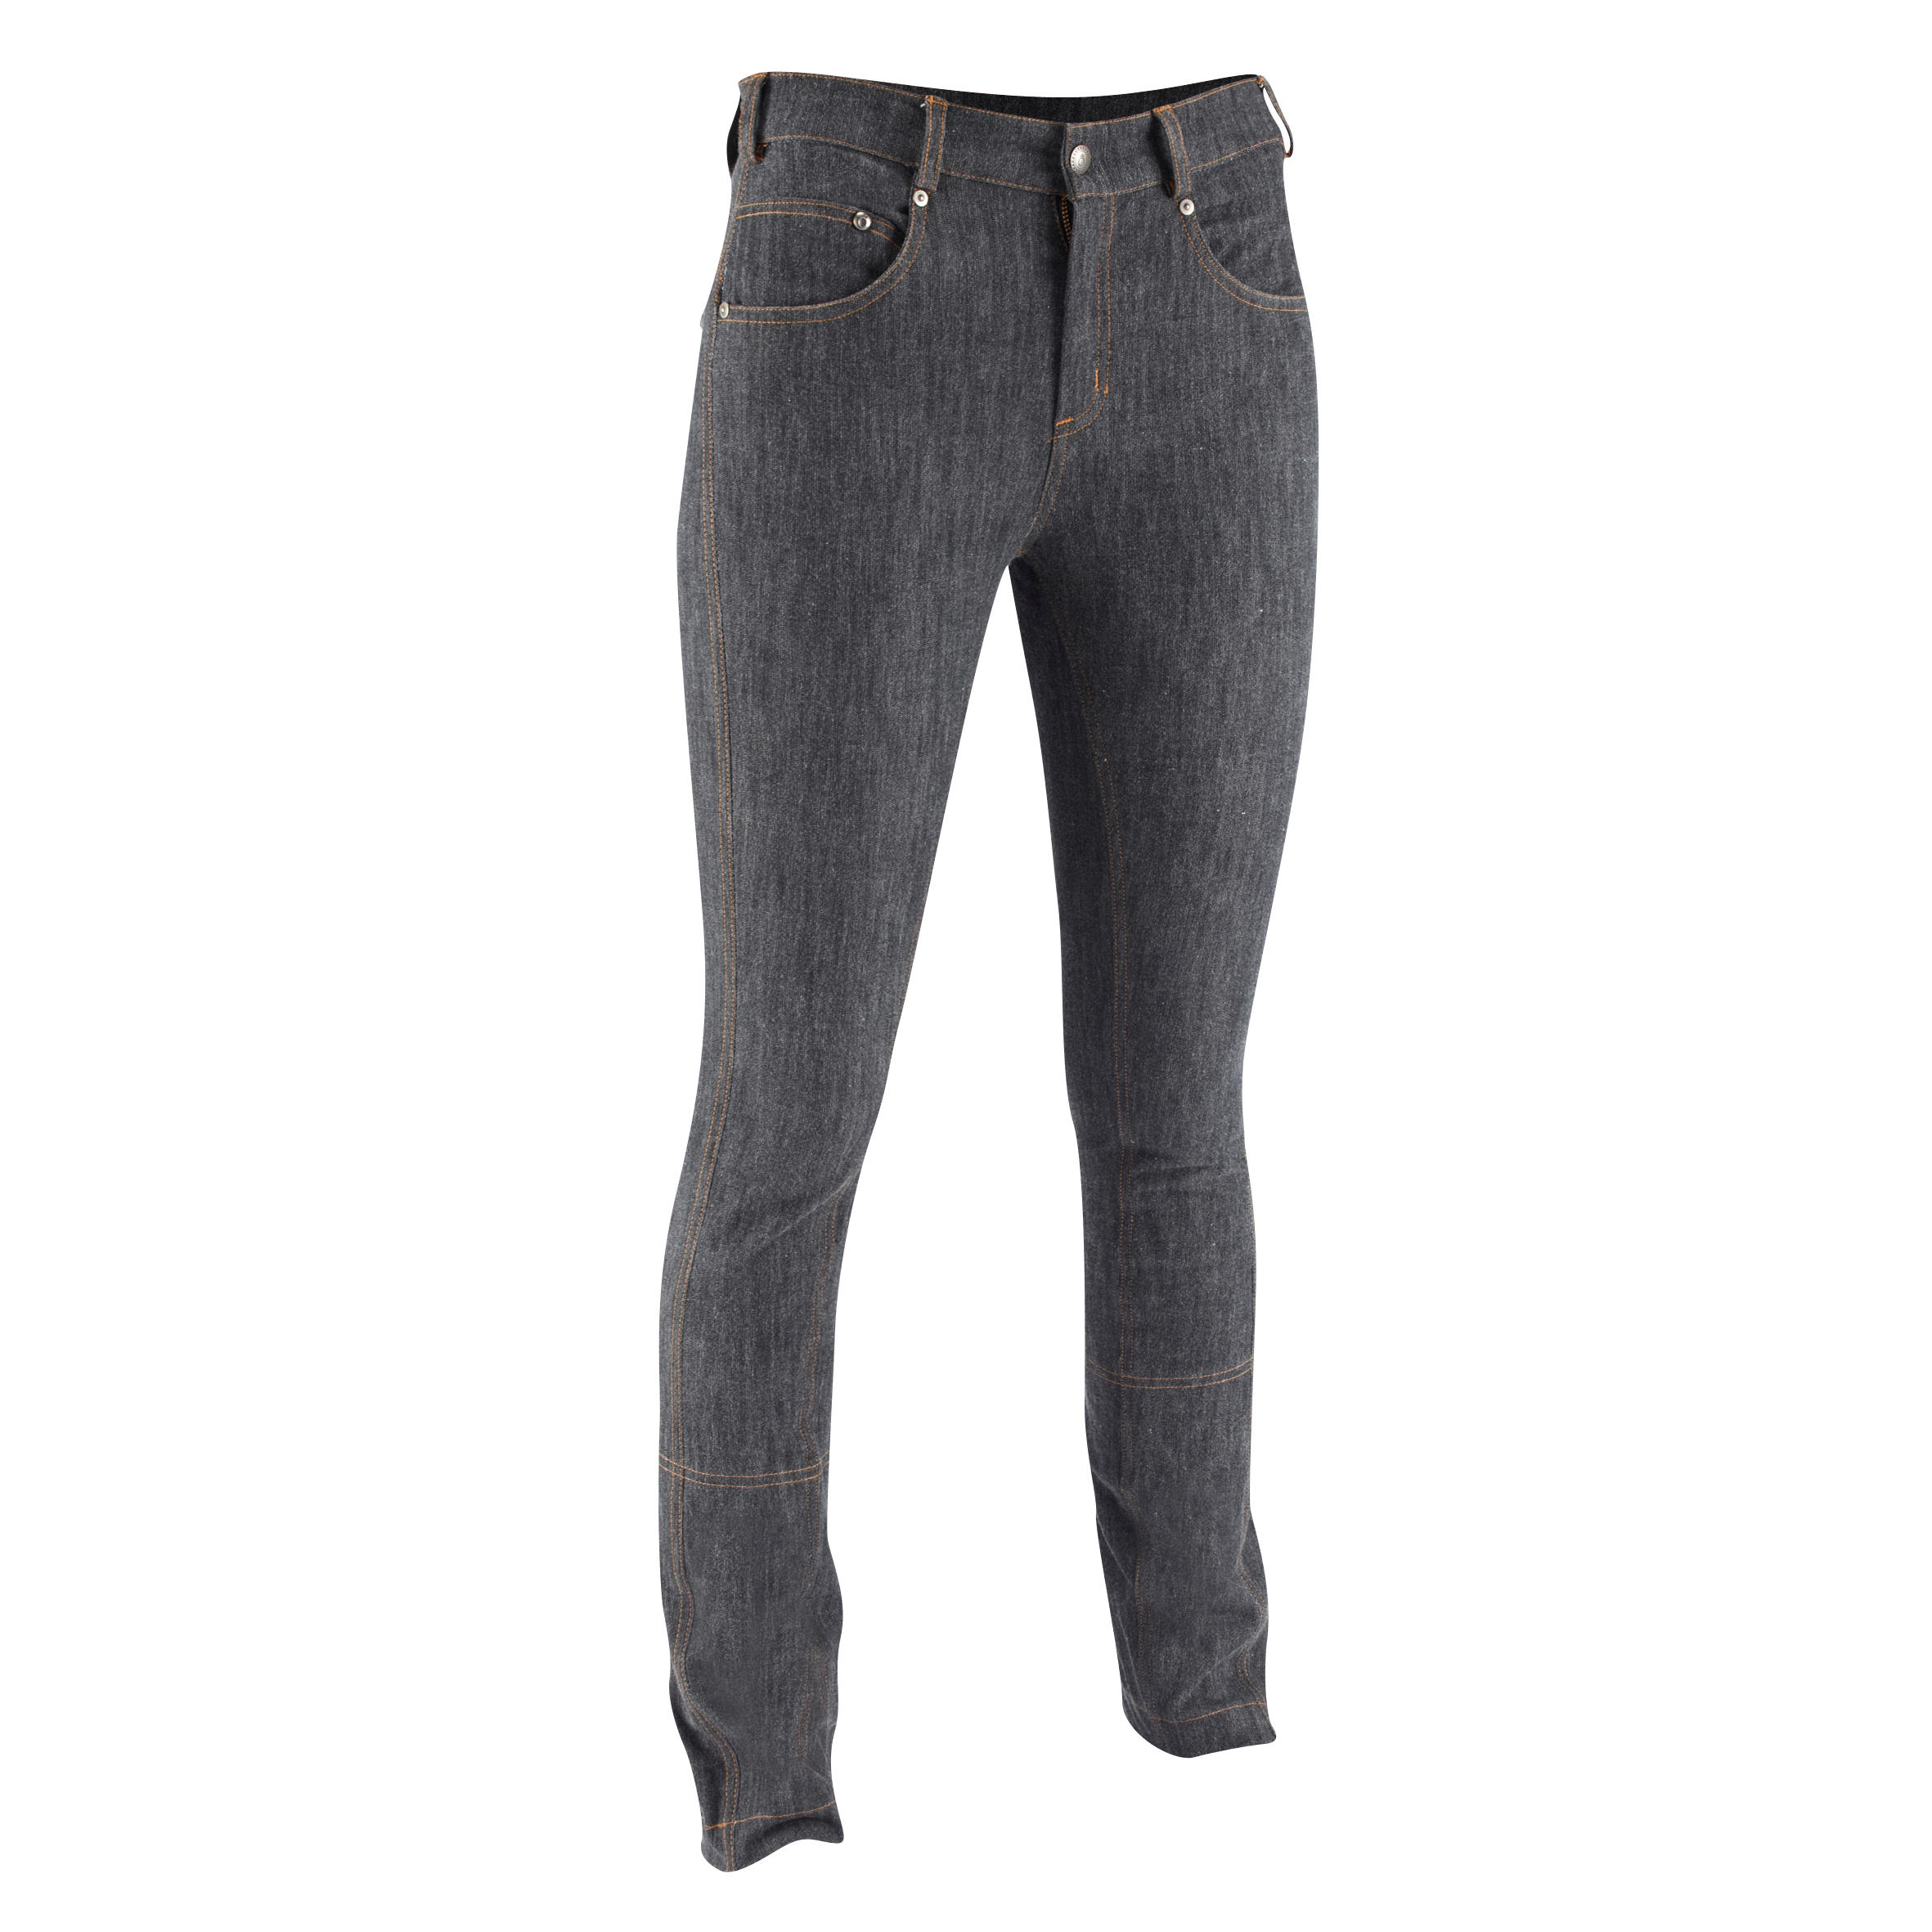 Pantalon Drept Jeans Gri Damă